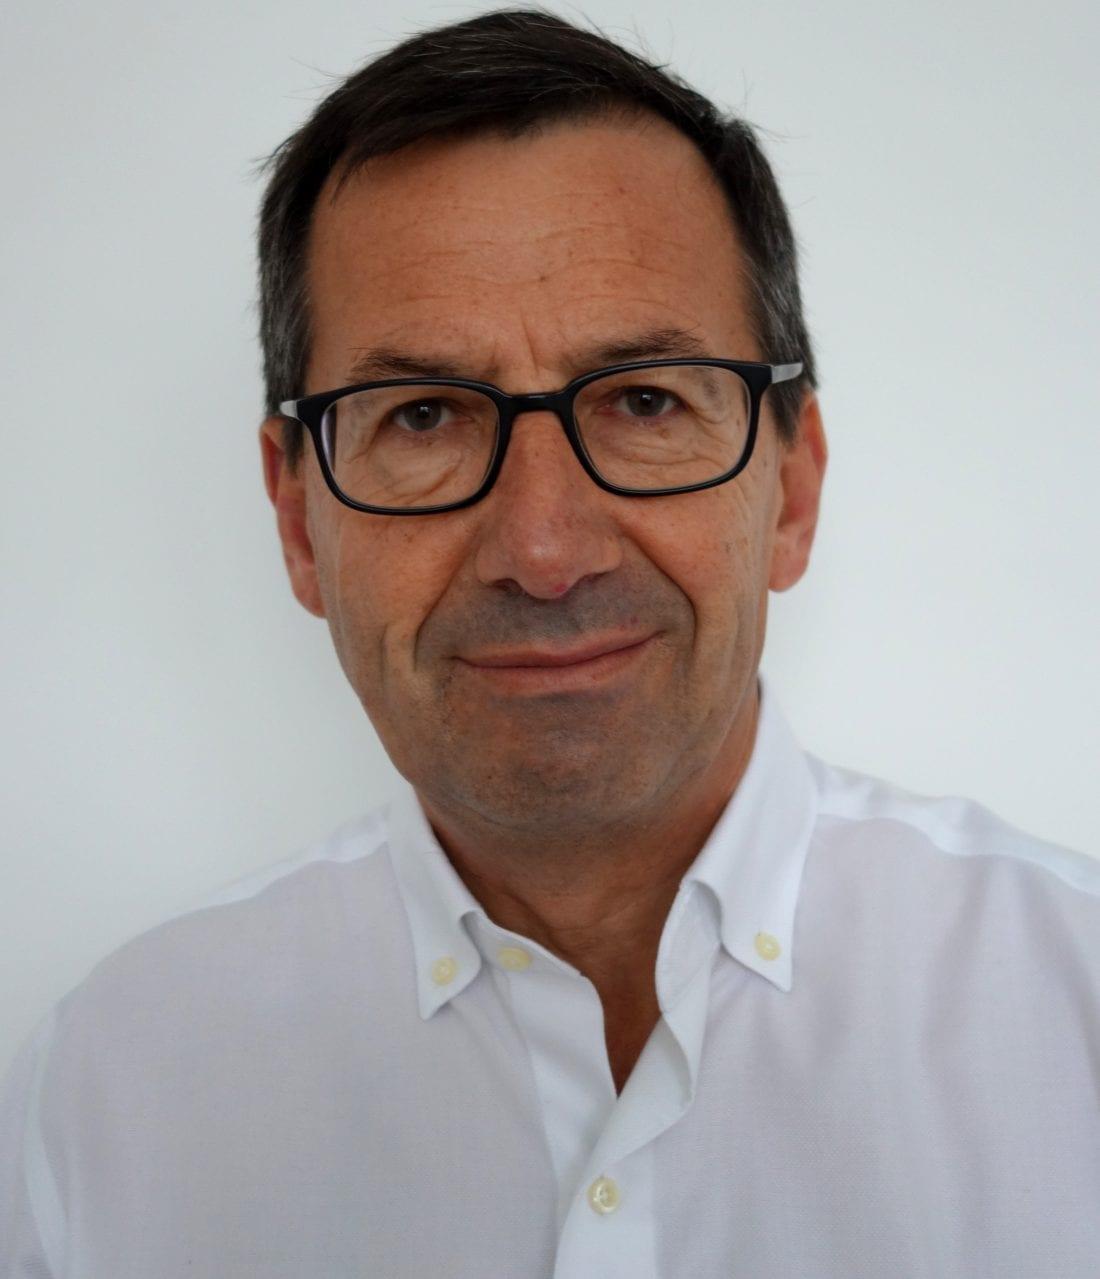 NCR David Lingham